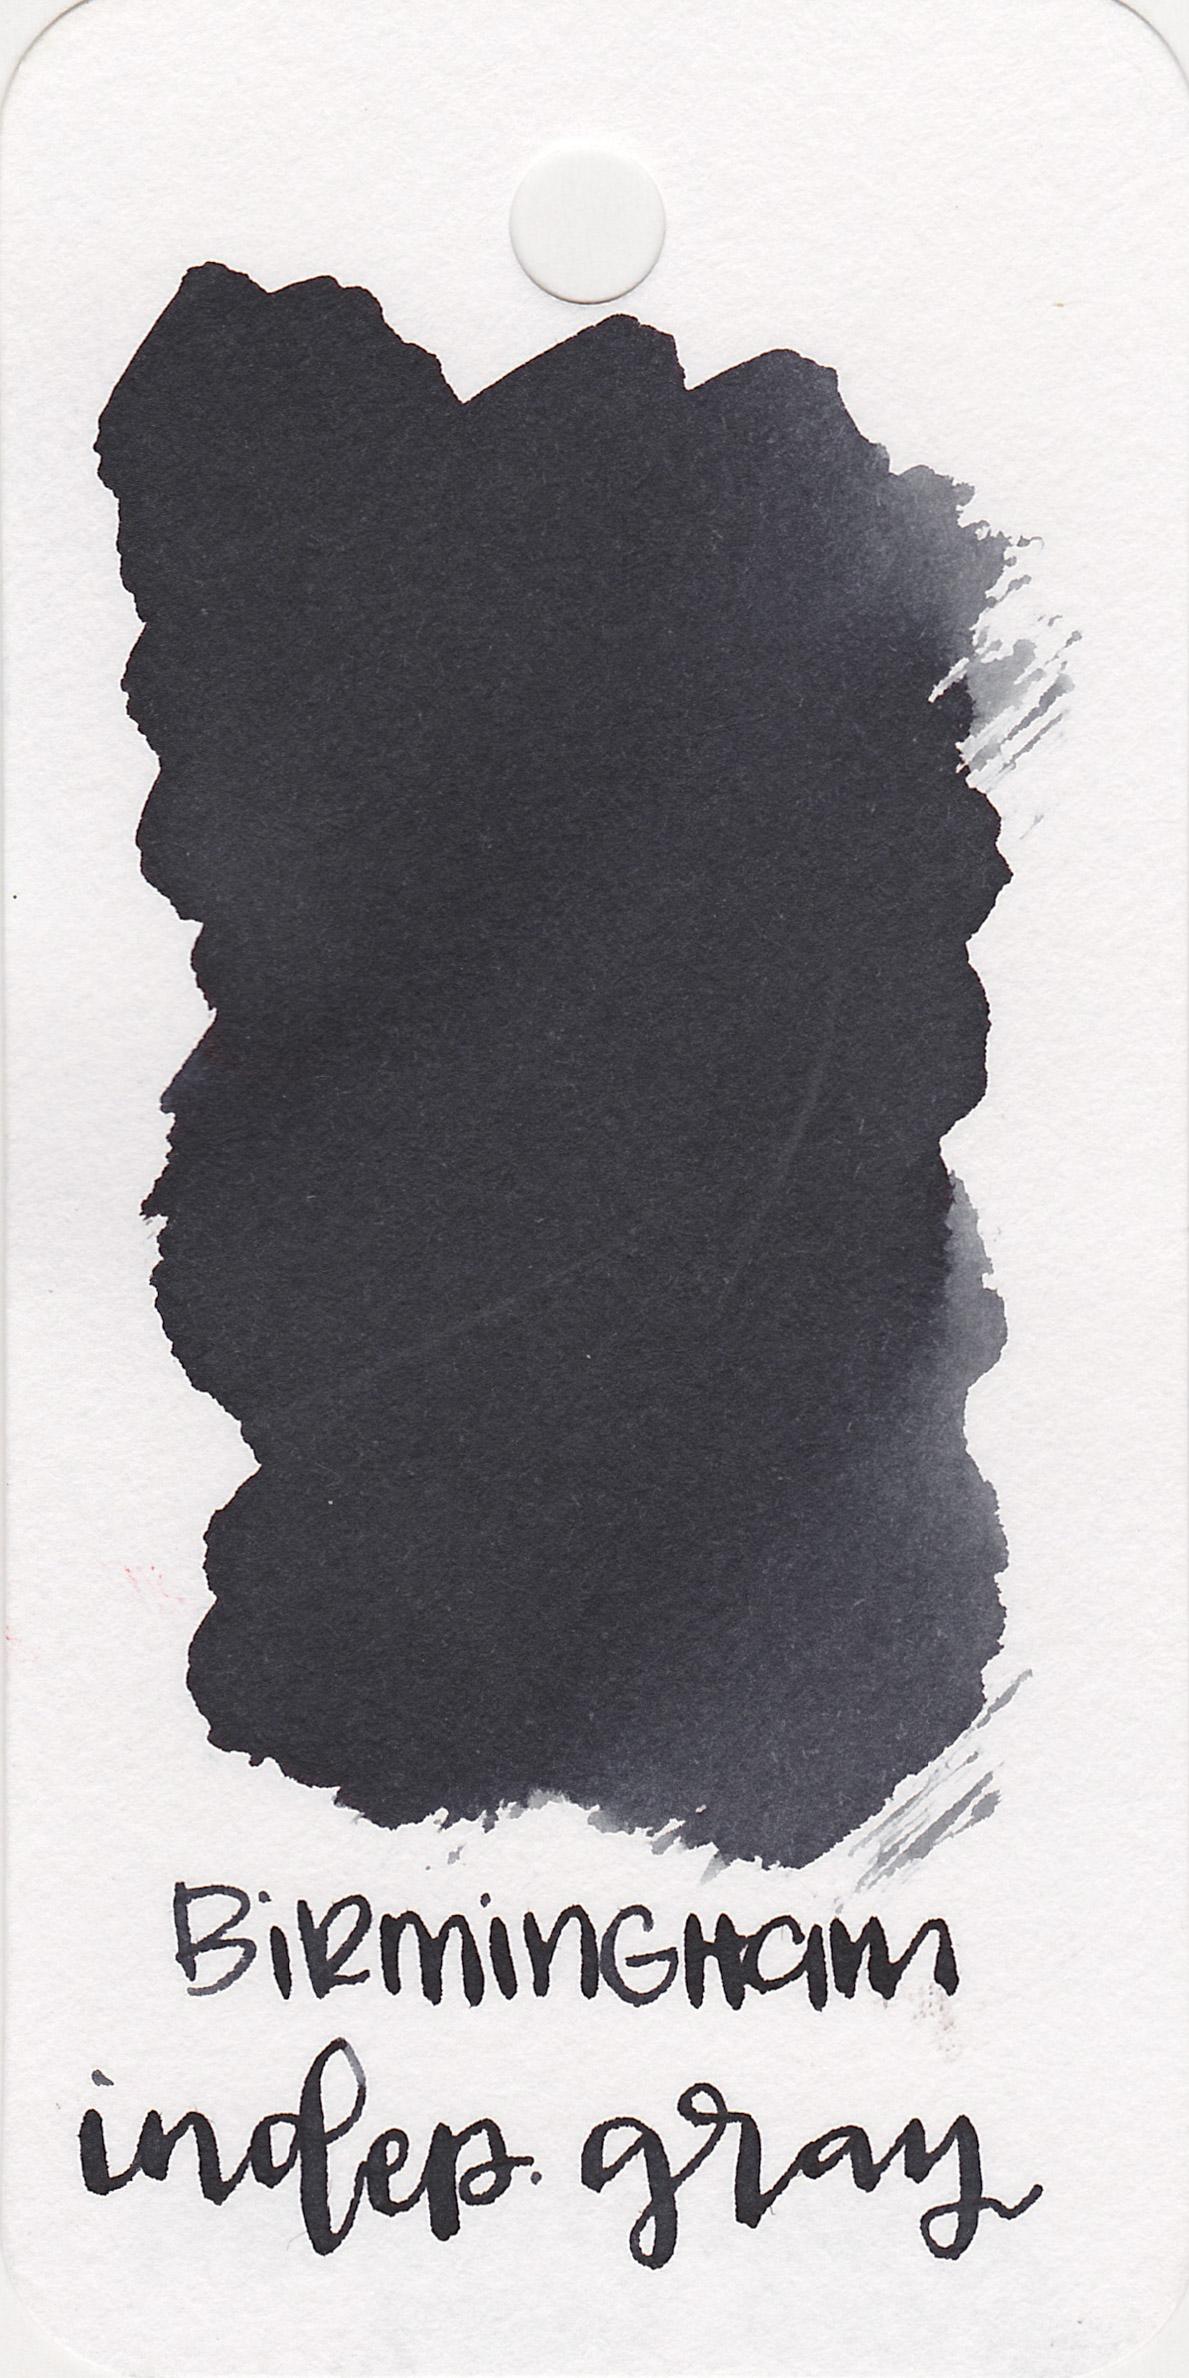 bp-grays-3.jpg